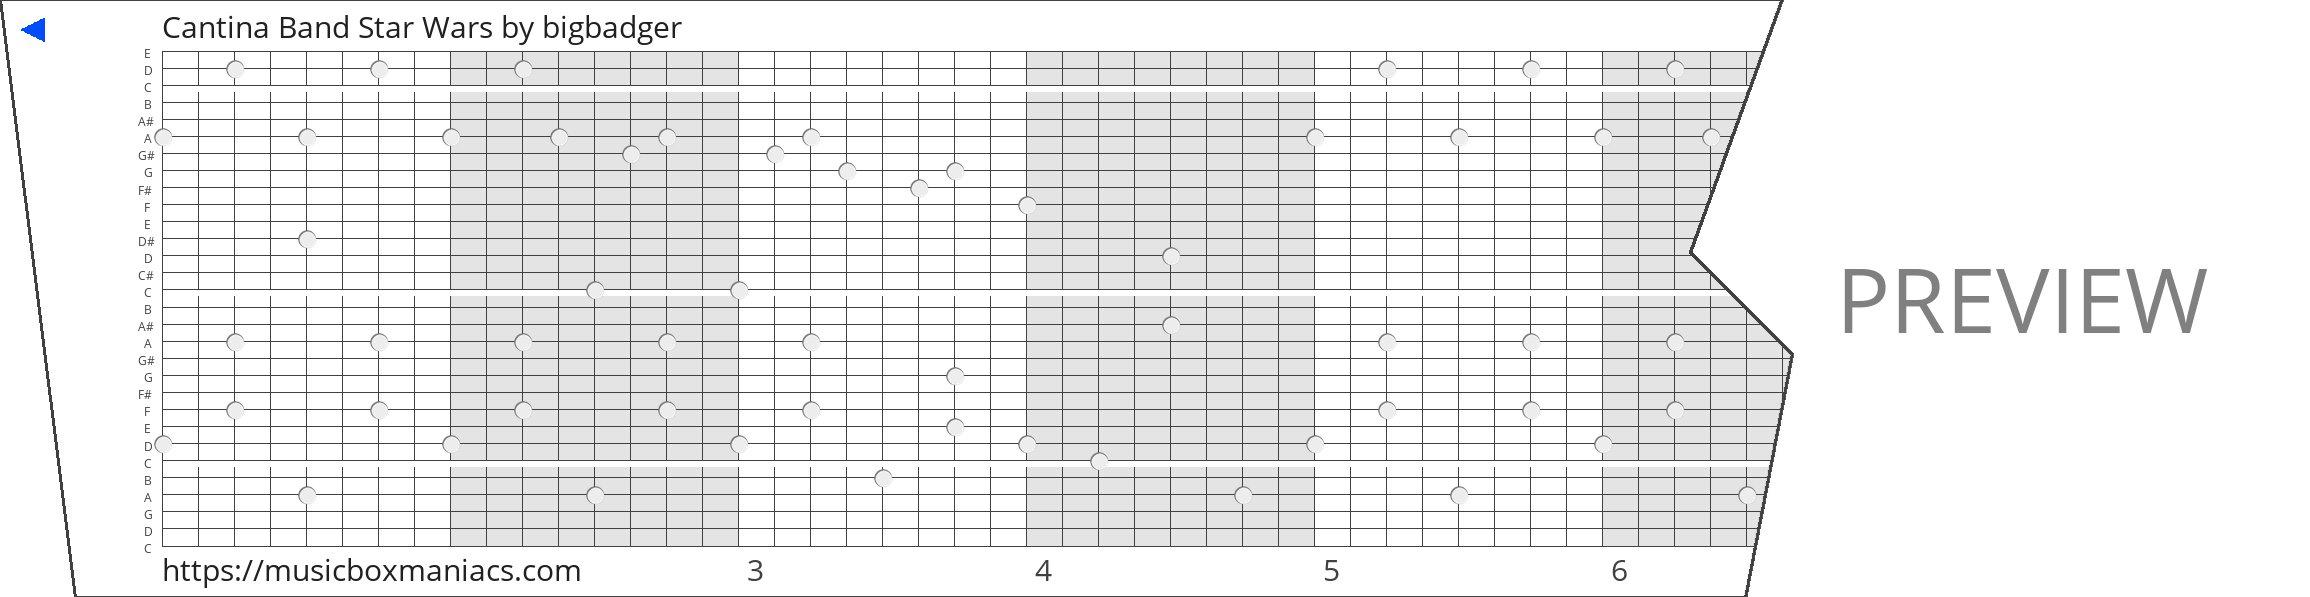 Cantina Band Star Wars 30 note music box paper strip